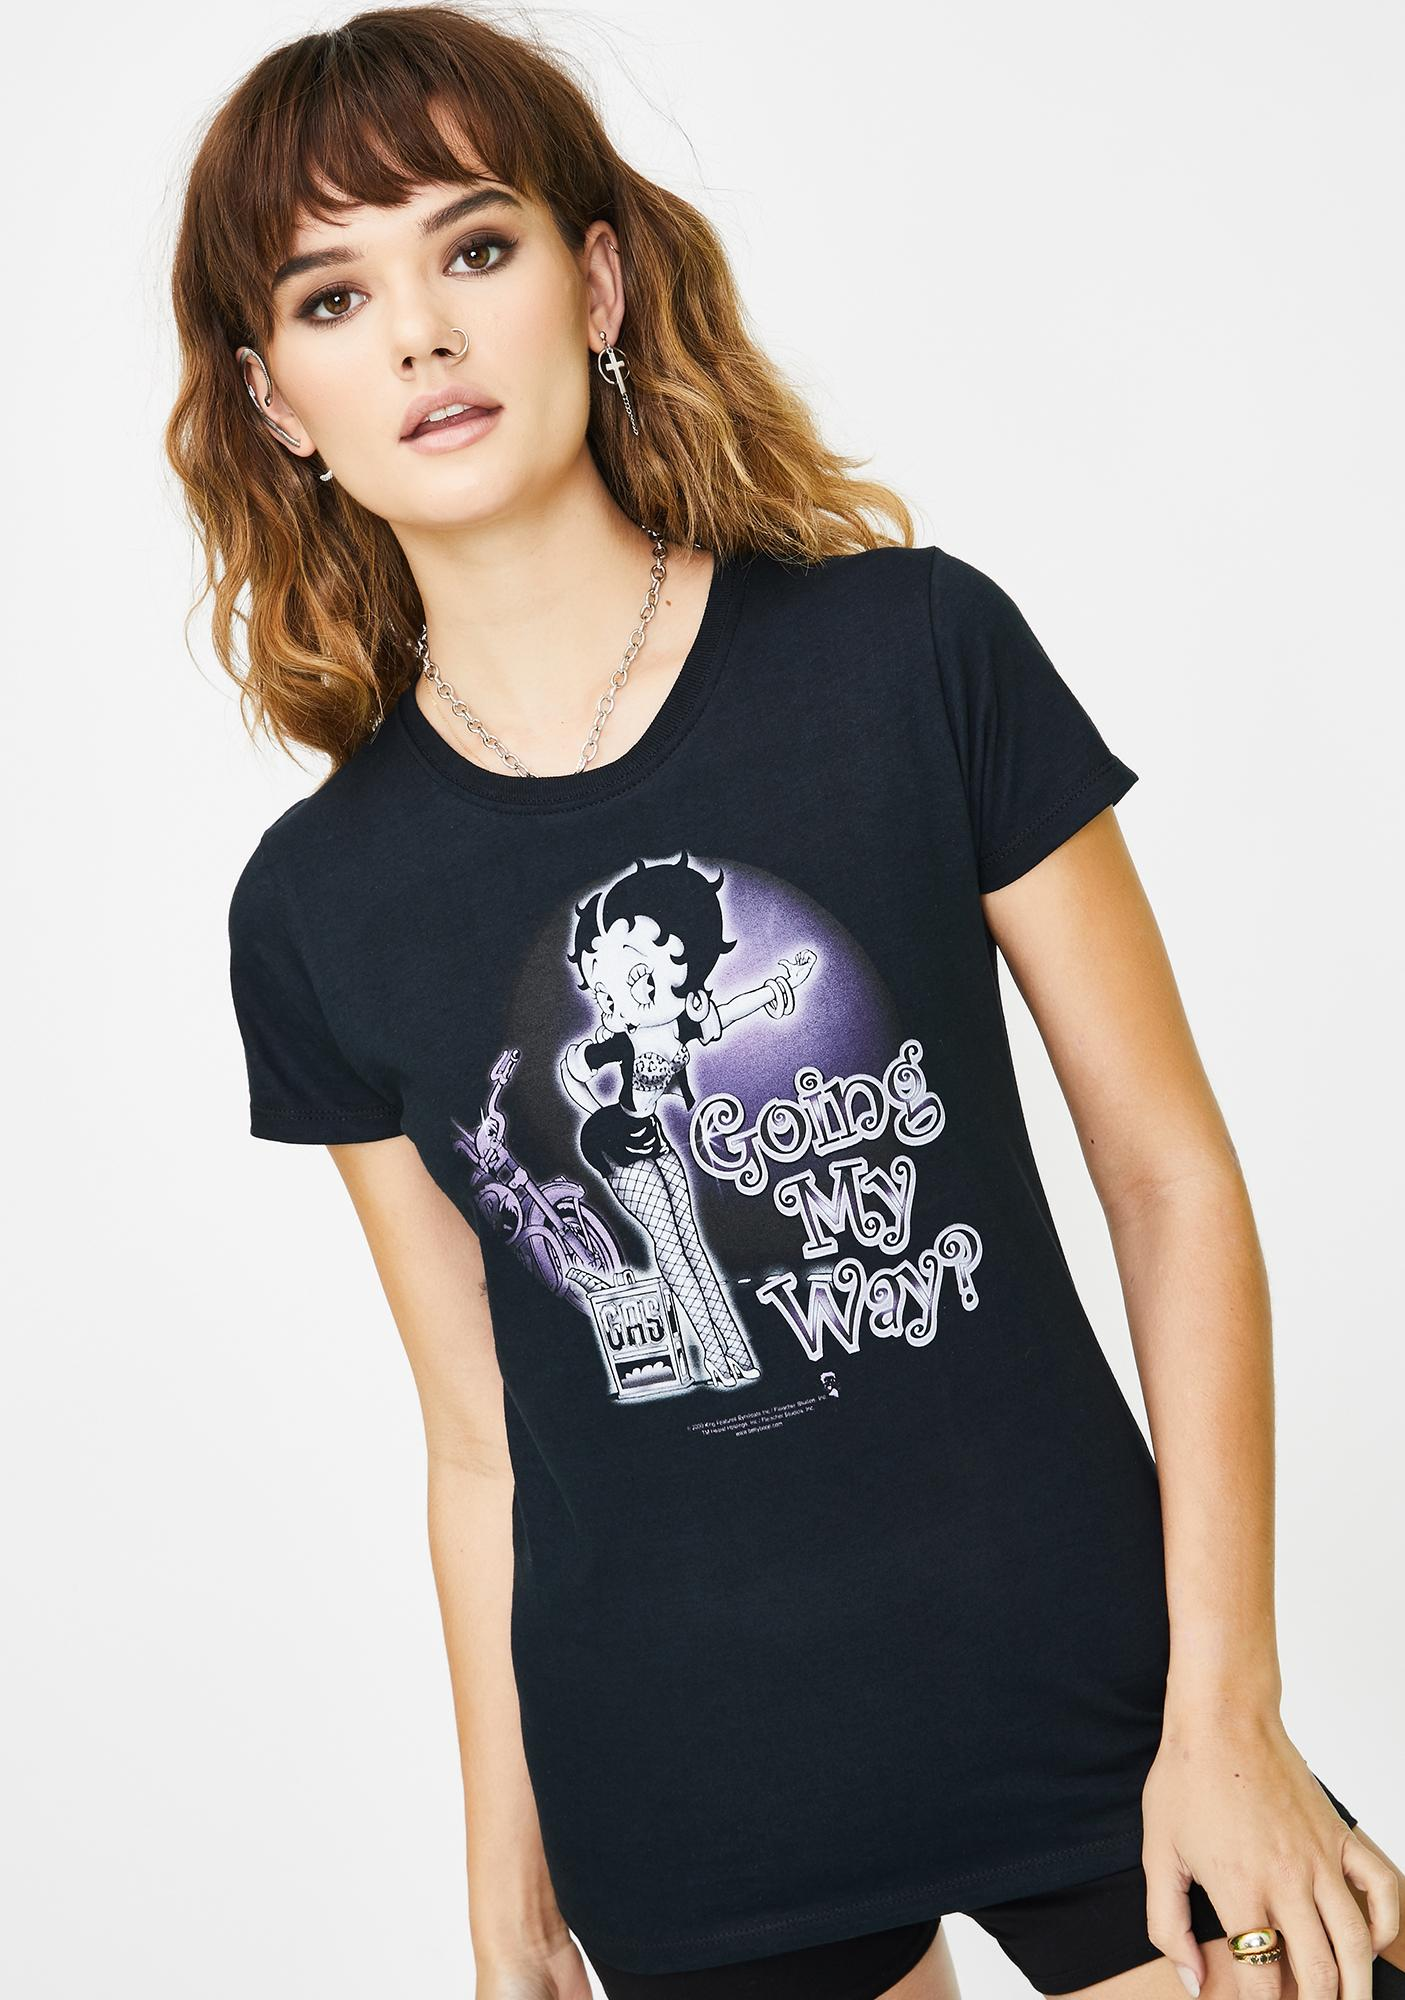 Trevco Betty Boop My Way Graphic Tee